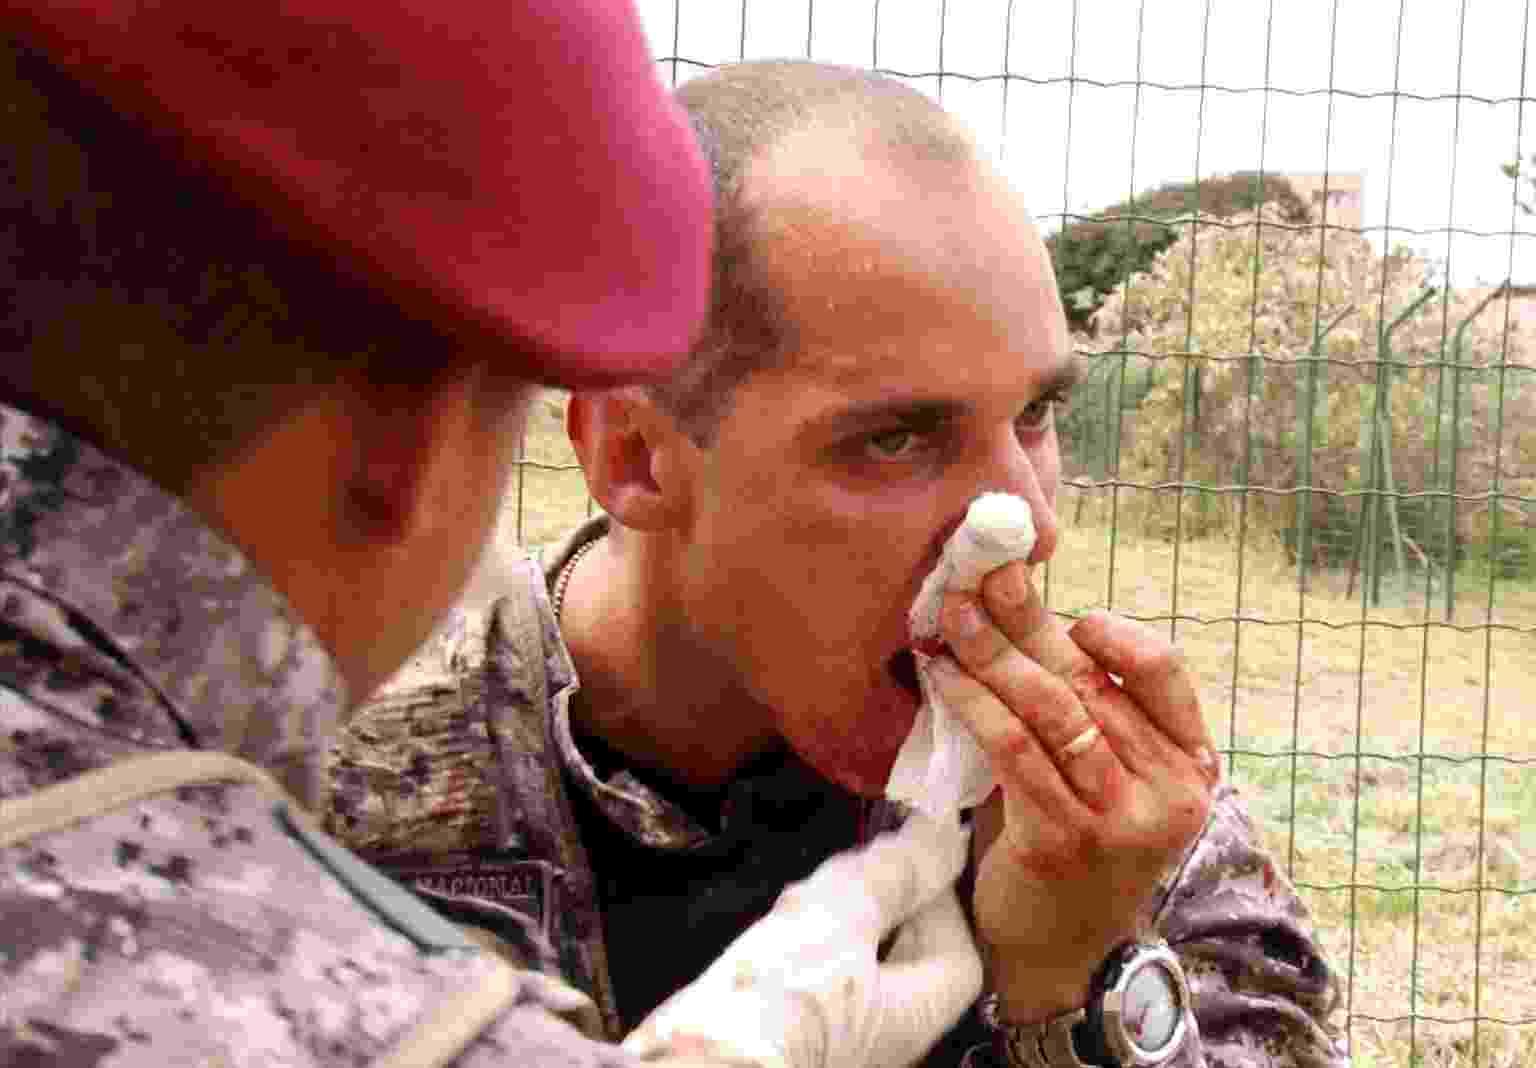 Integrante da Força Nacional se fere - Kleyton Amorim/UOL